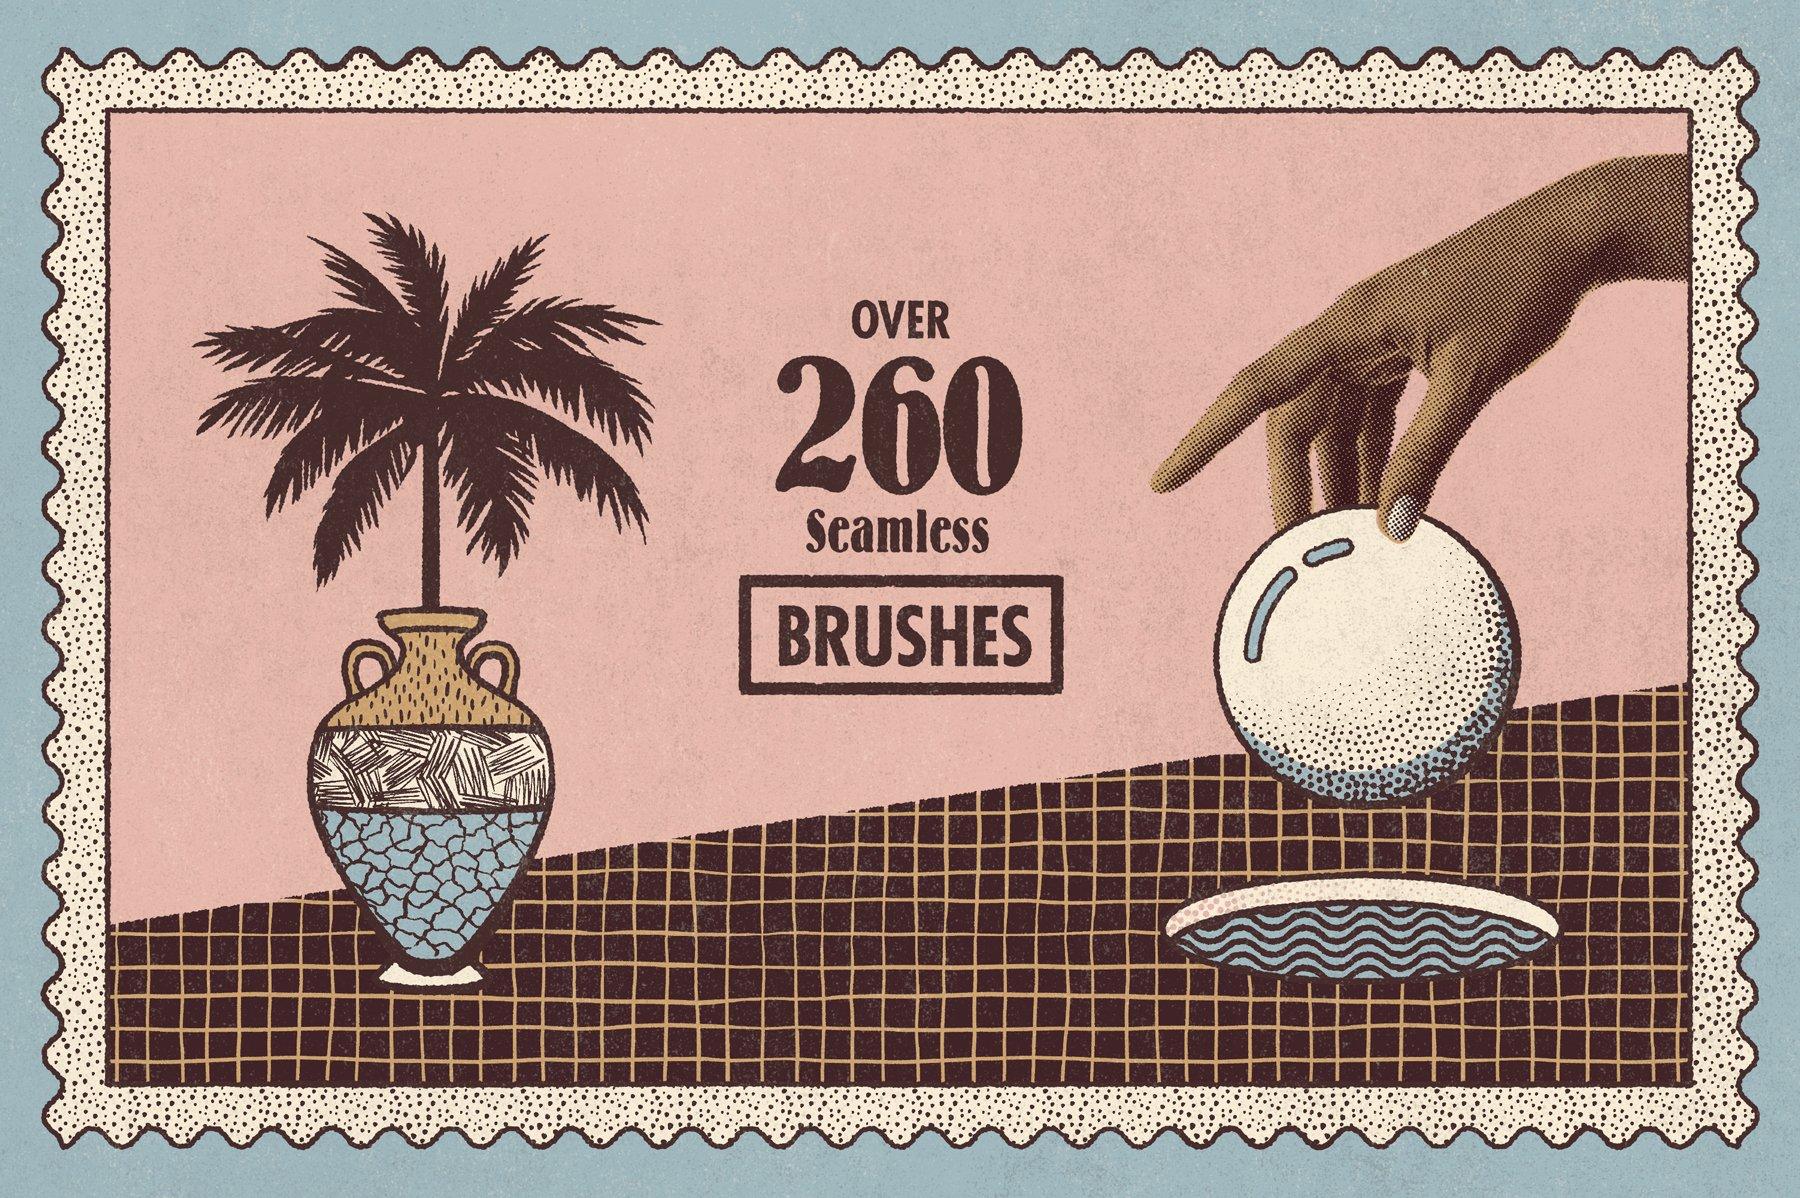 260多款潮流复古艺术图案绘画画笔PS笔刷设计素材 Lithotone Brushes For Photoshop插图2